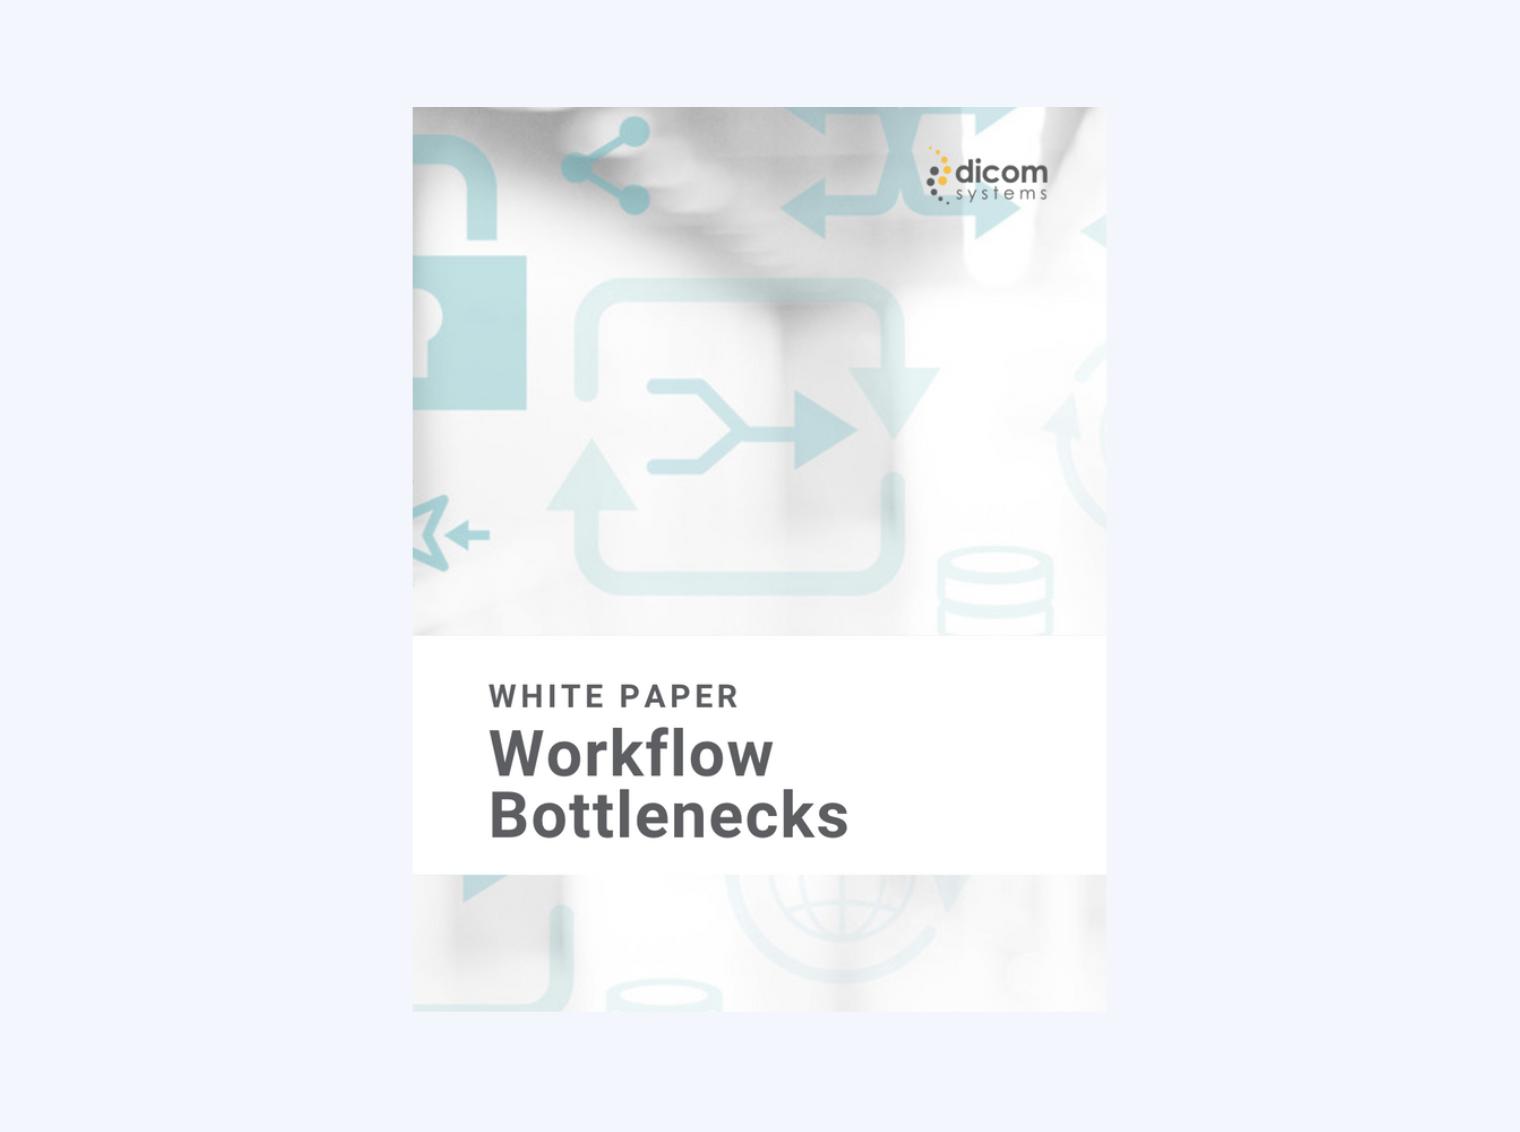 Workflow Bottlenecks White Paper